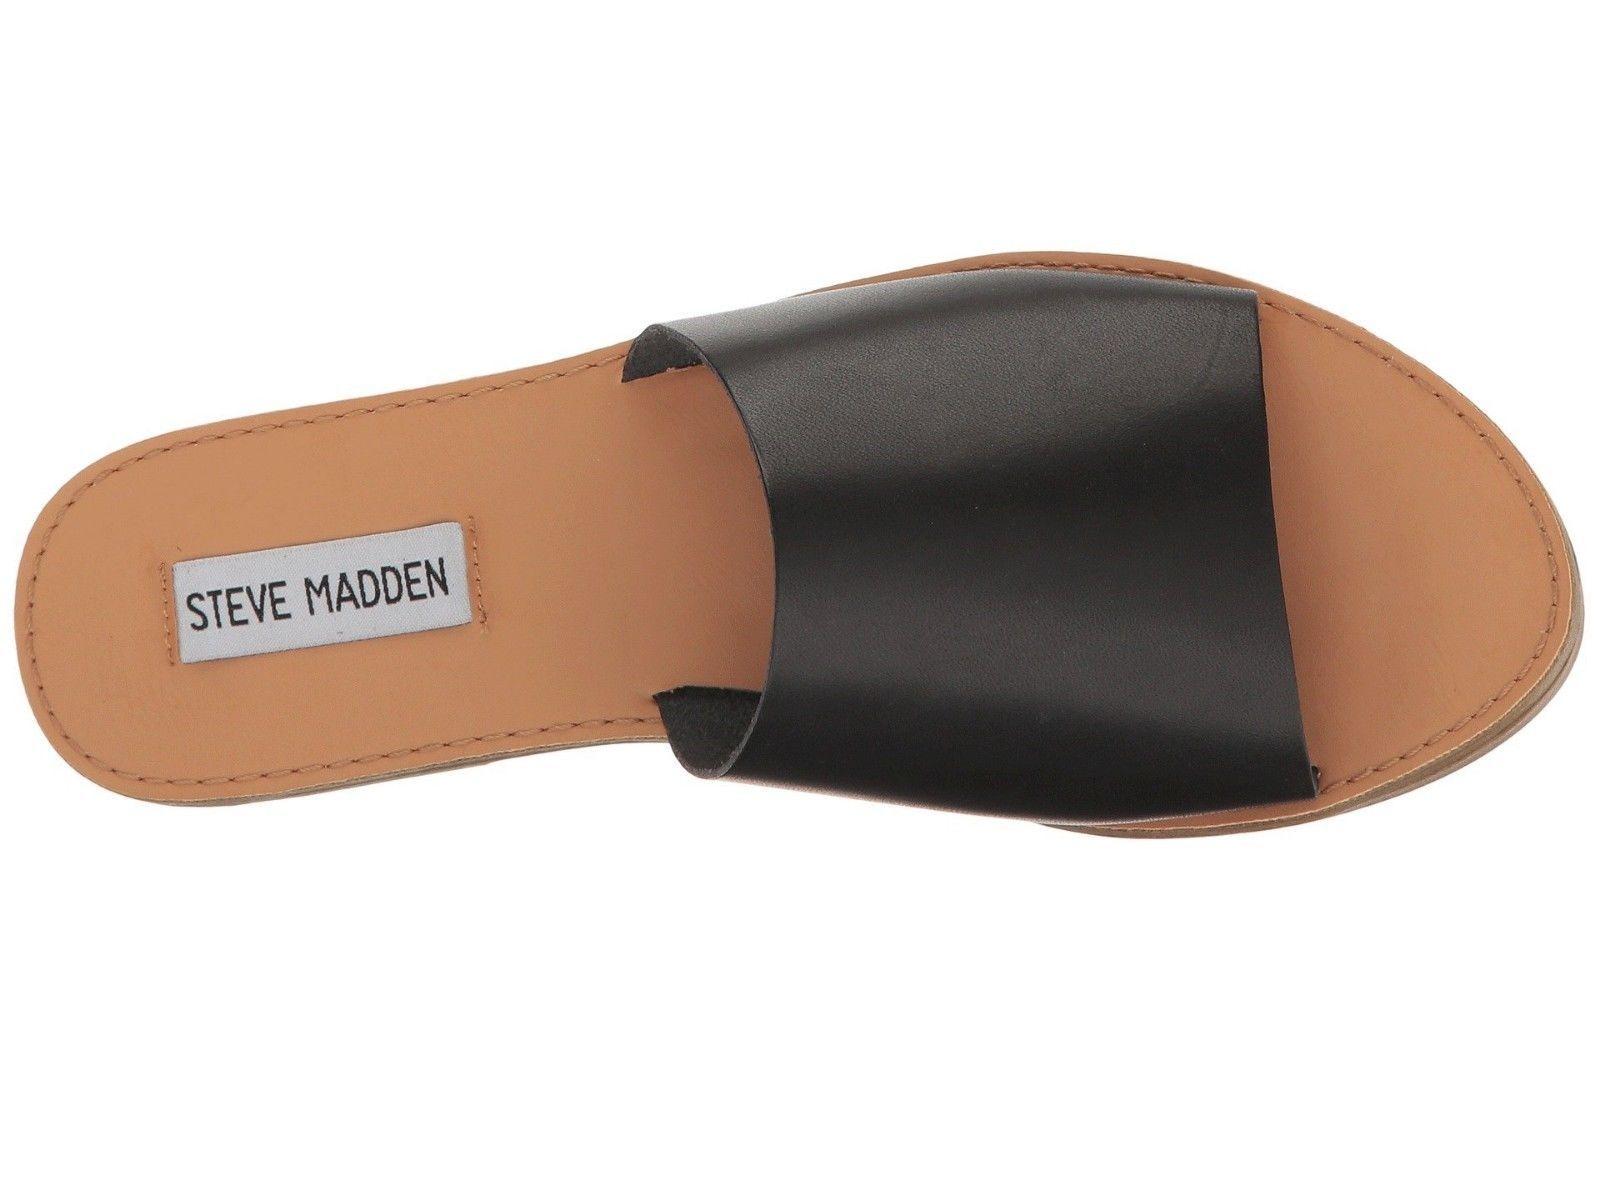 f59a97f931e Steve Madden Grace Slide Sandals Black and 50 similar items